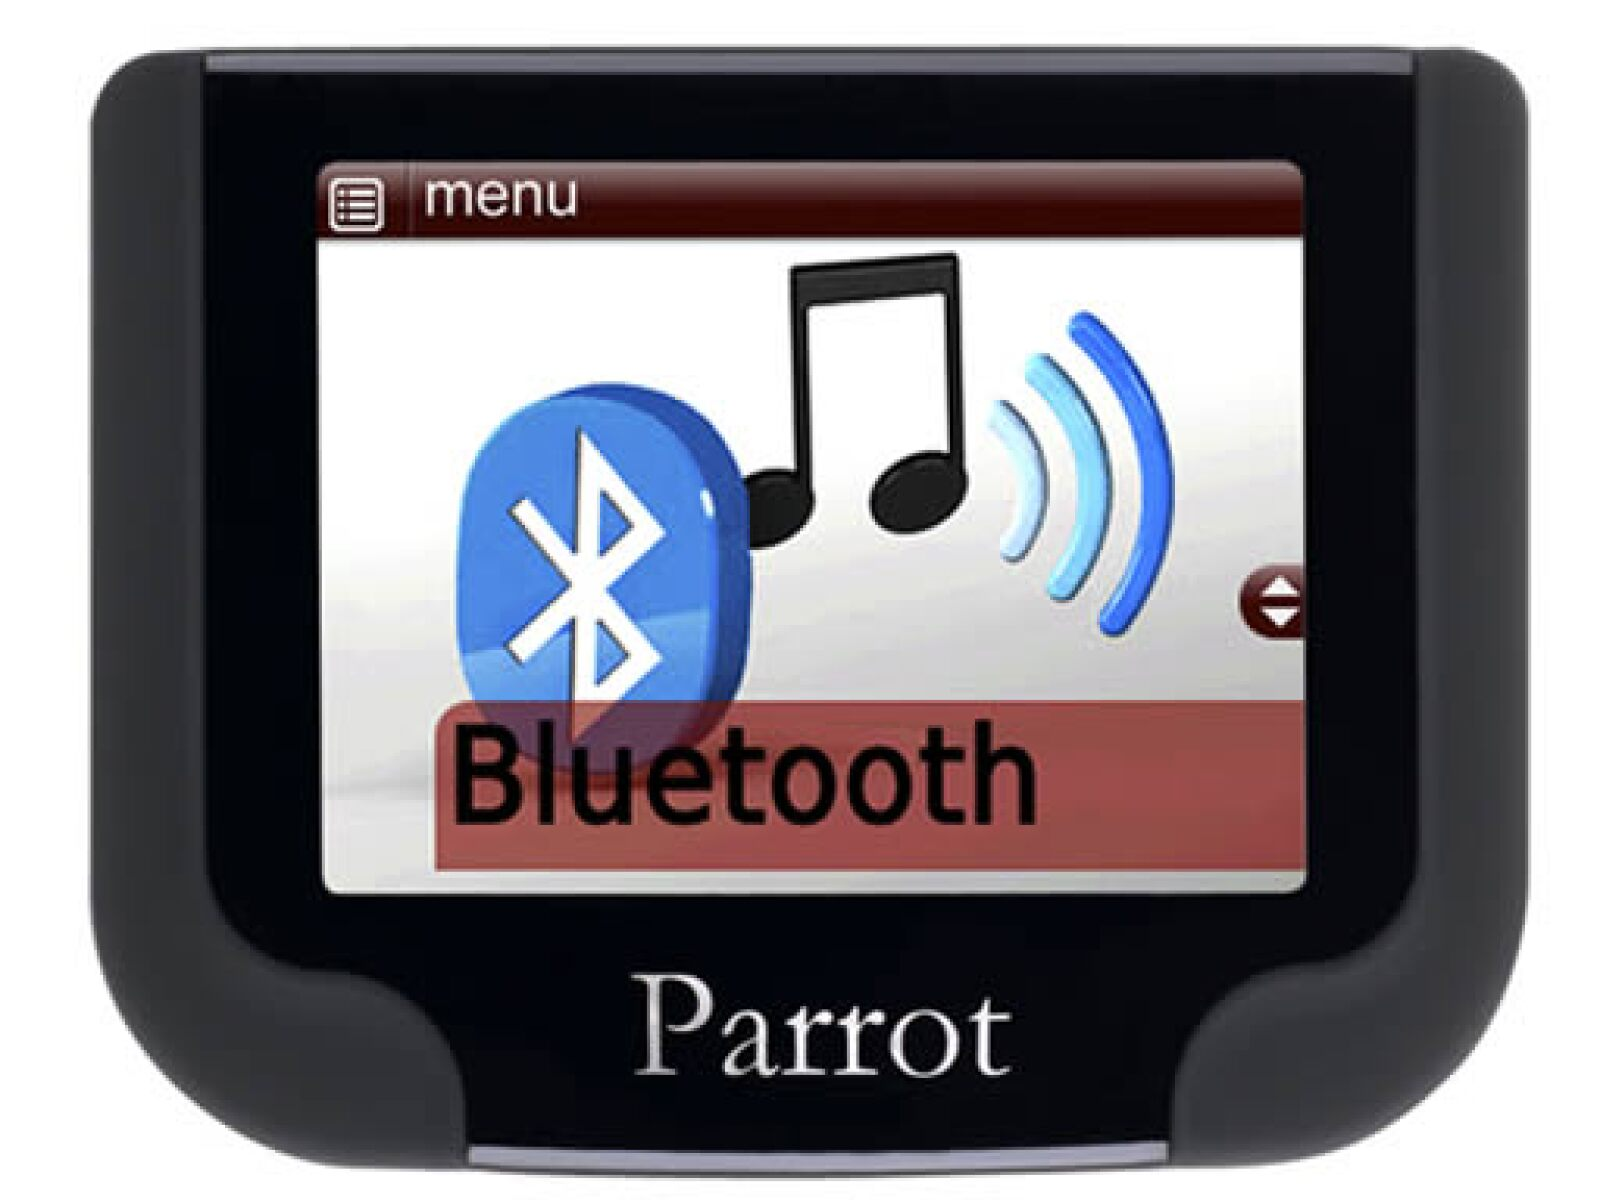 Parrot MKi te permite tener una sincronización con tu teléfono celular.